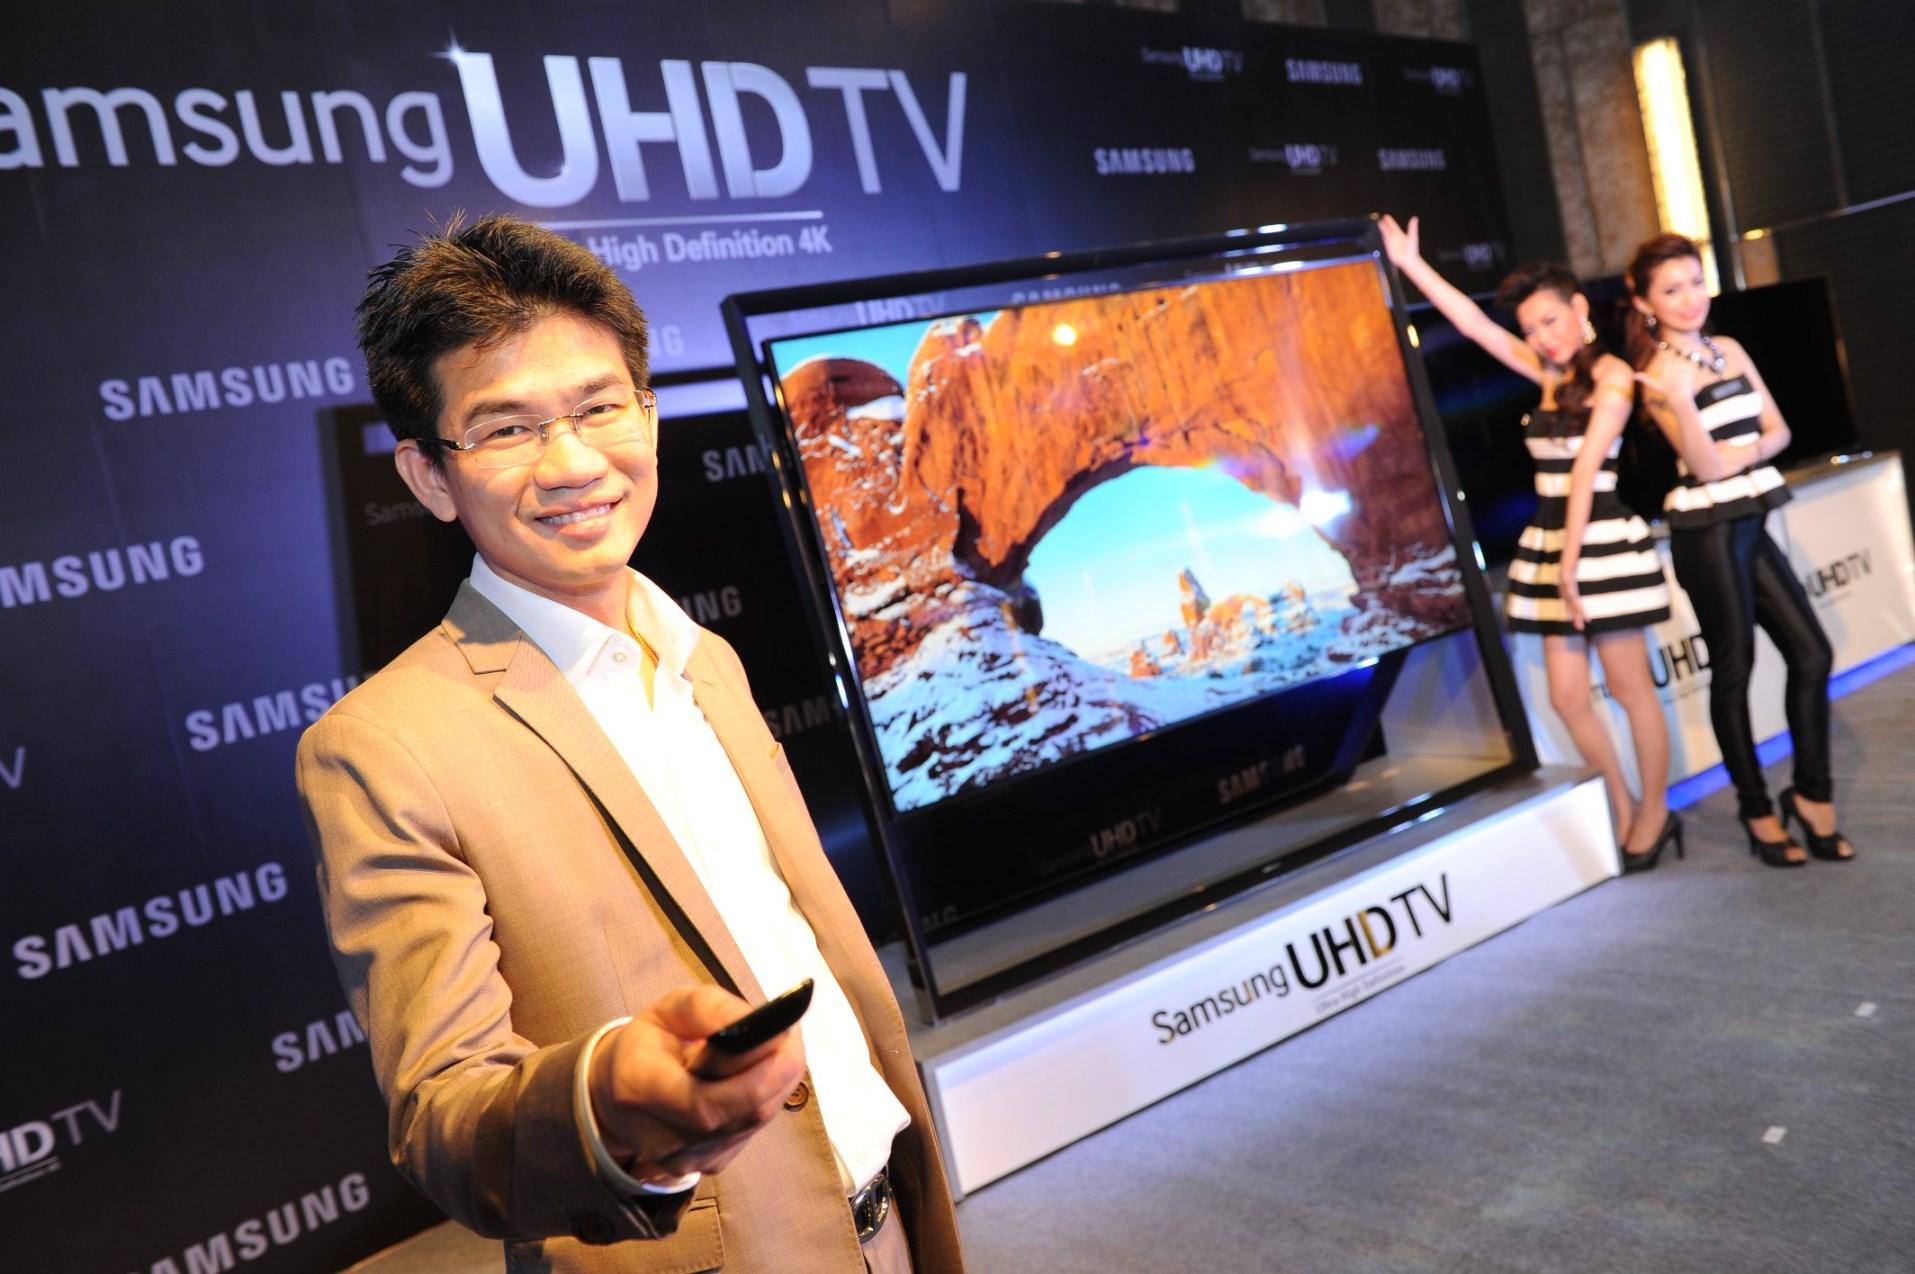 sumsung-uhd-tv (6)